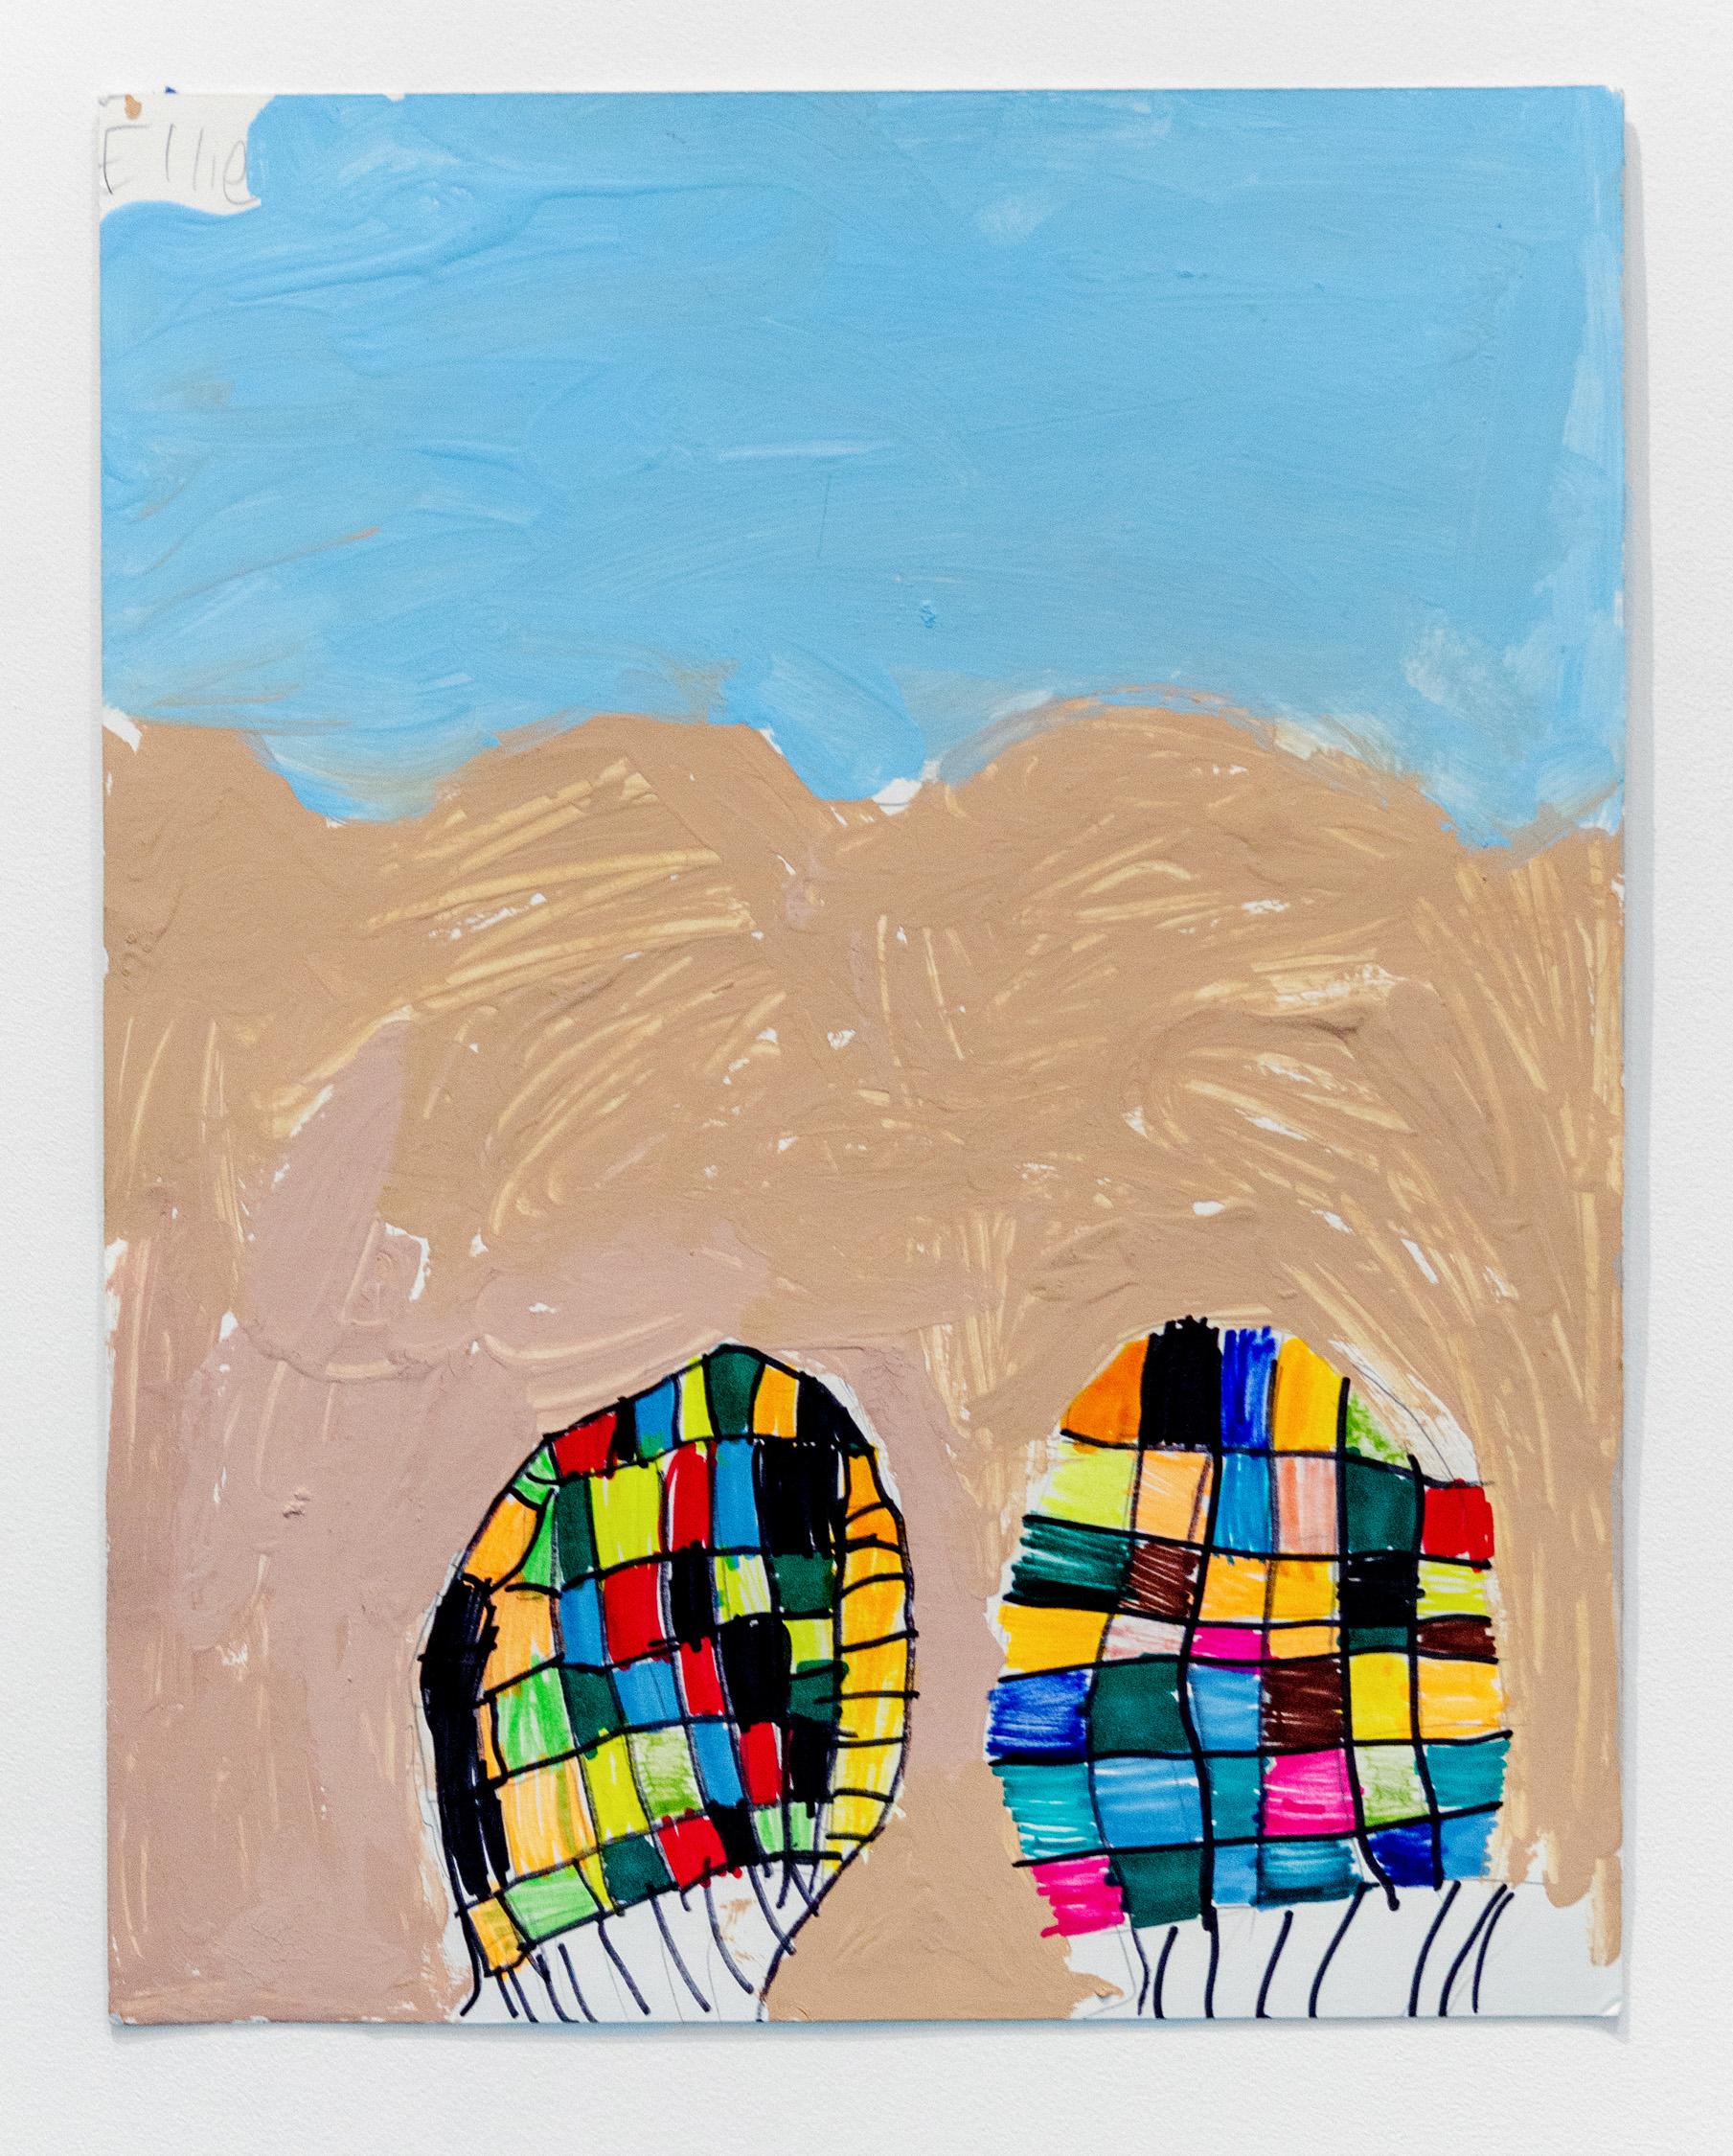 Ellie Rosenblatt   Feet on the Beach , 2019 Acrylic, marker and pencil on paper 14 x 11 inches (35.5 x 28 cm)  Starting bid: $20